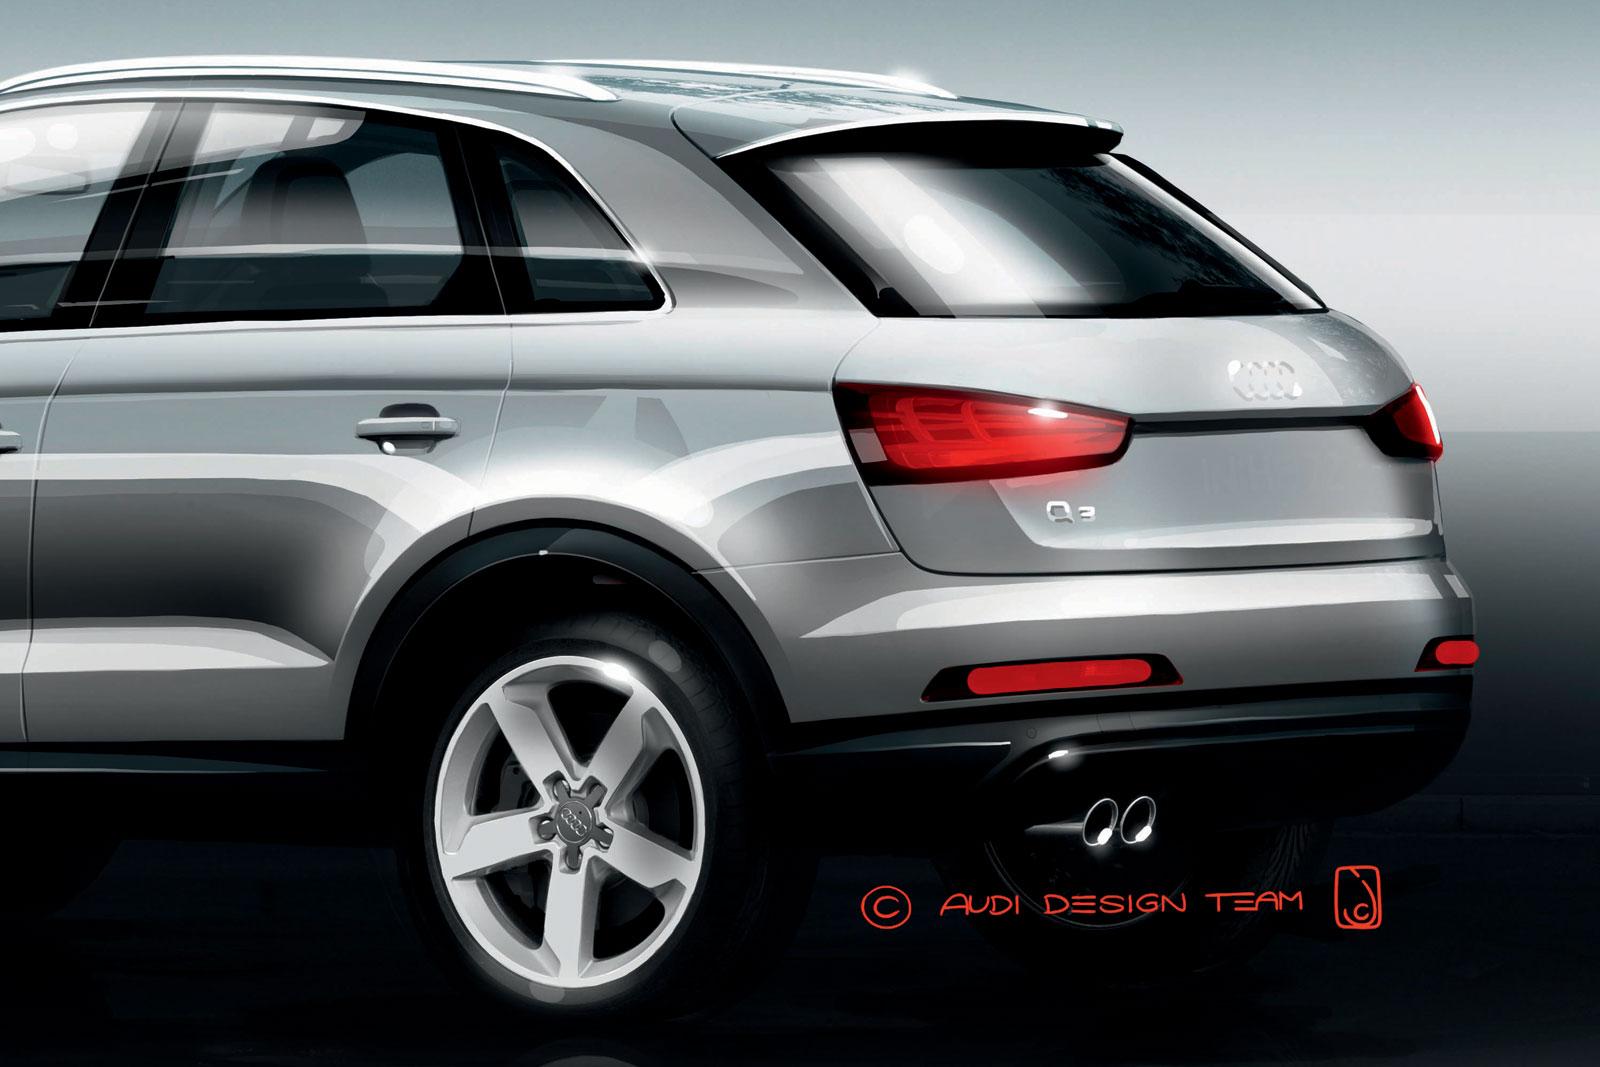 http://1.bp.blogspot.com/-l9GhA1DsQF4/TZ9dZ3sogpI/AAAAAAAAEcg/G2zazTAZiVY/s1600/Audi-Q3-Teaser-Sketch-7.jpg